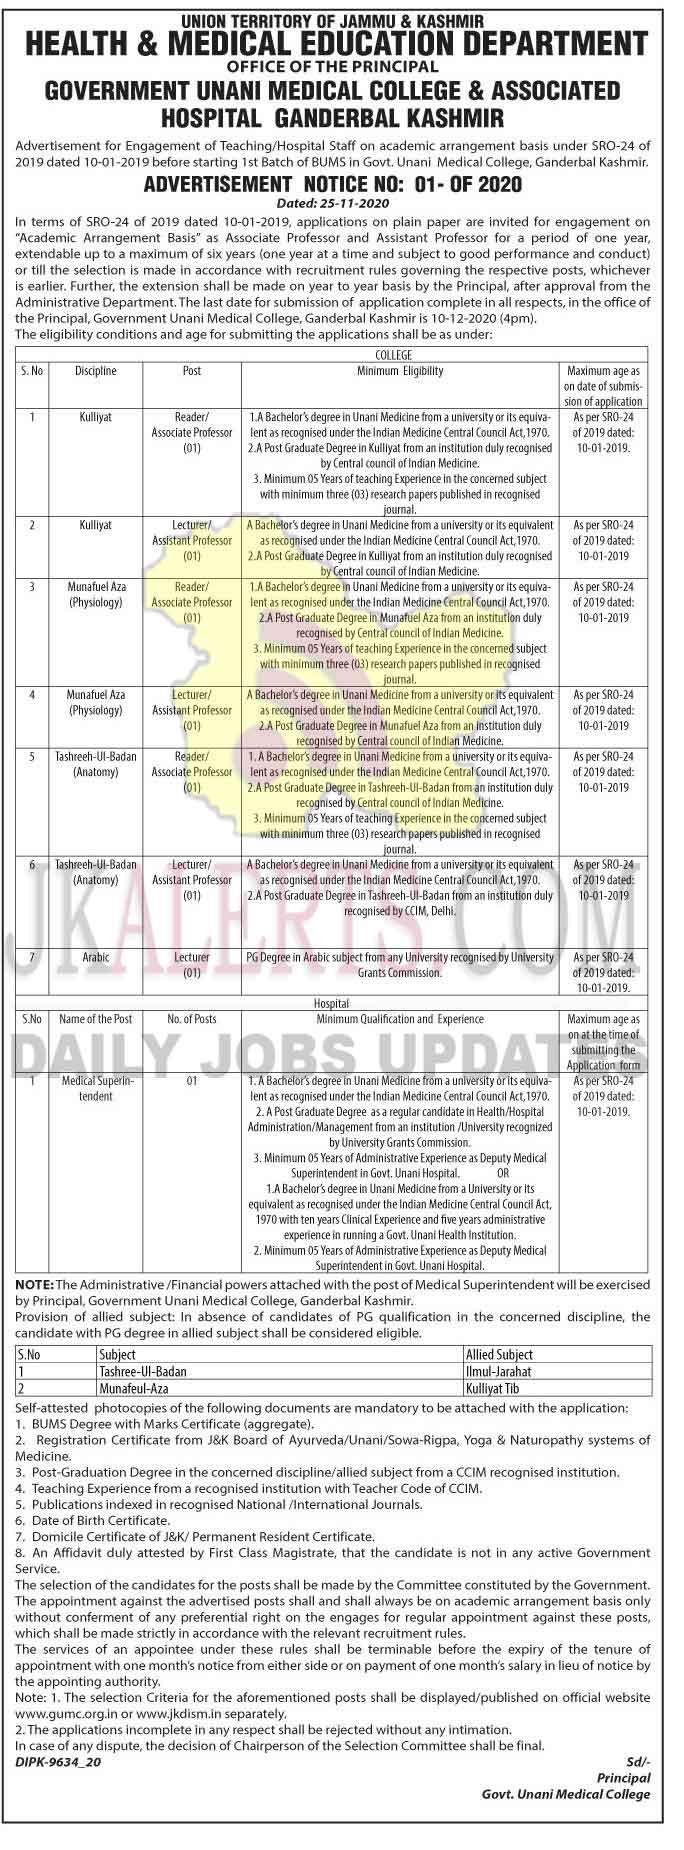 Govt Unani Medical College and Associated Hospital Kashmir Jobs recruitment 2020.